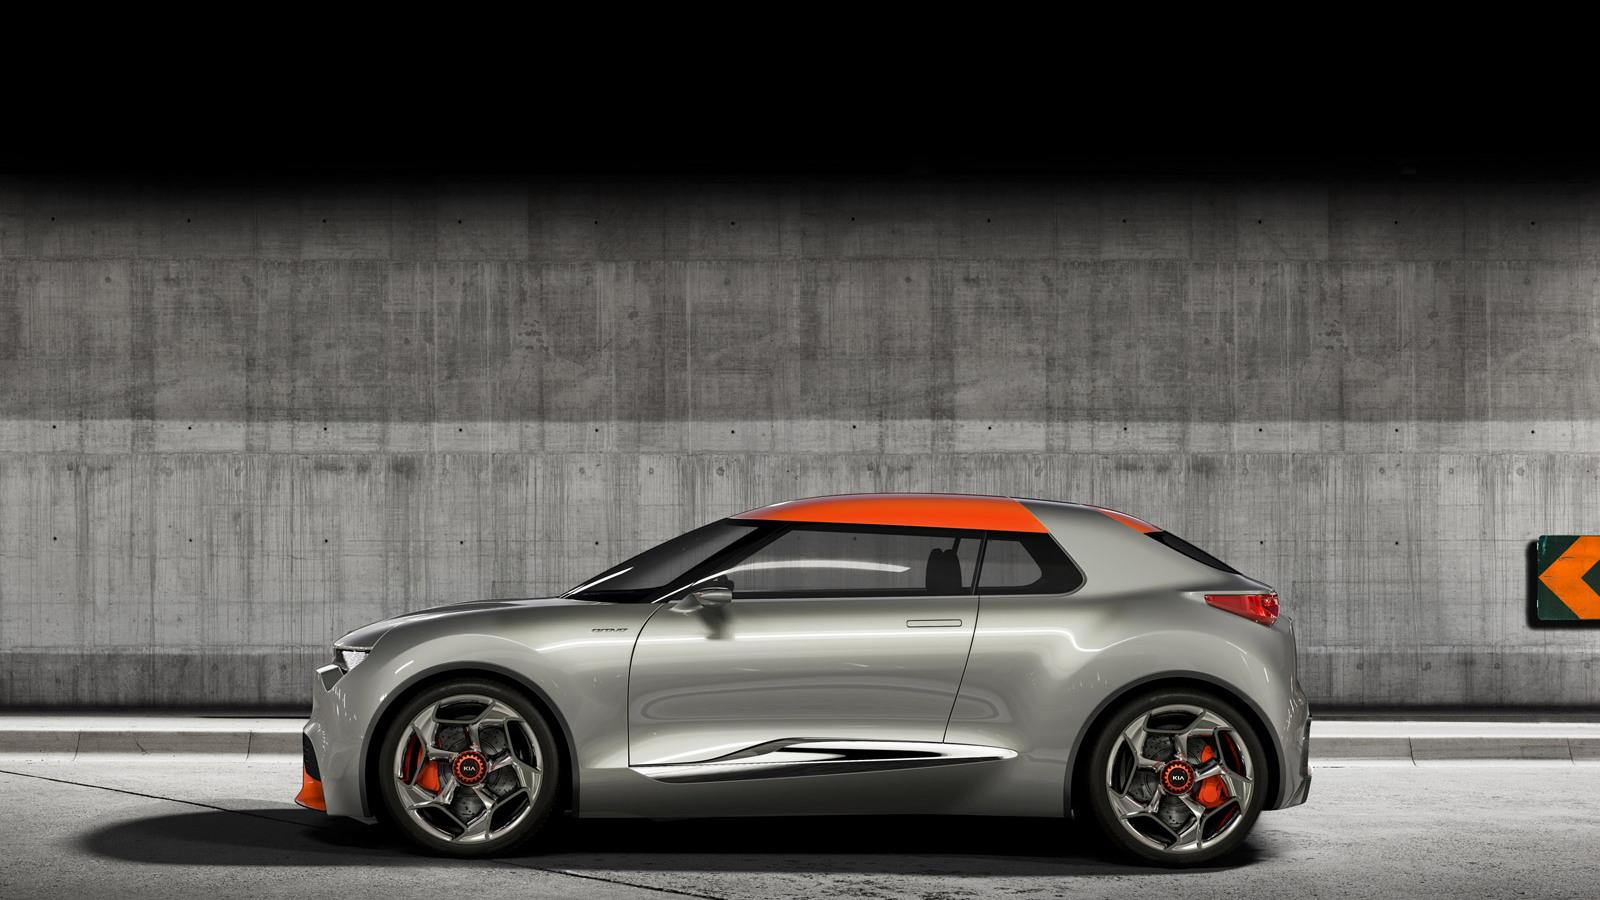 Kia Provo concept car